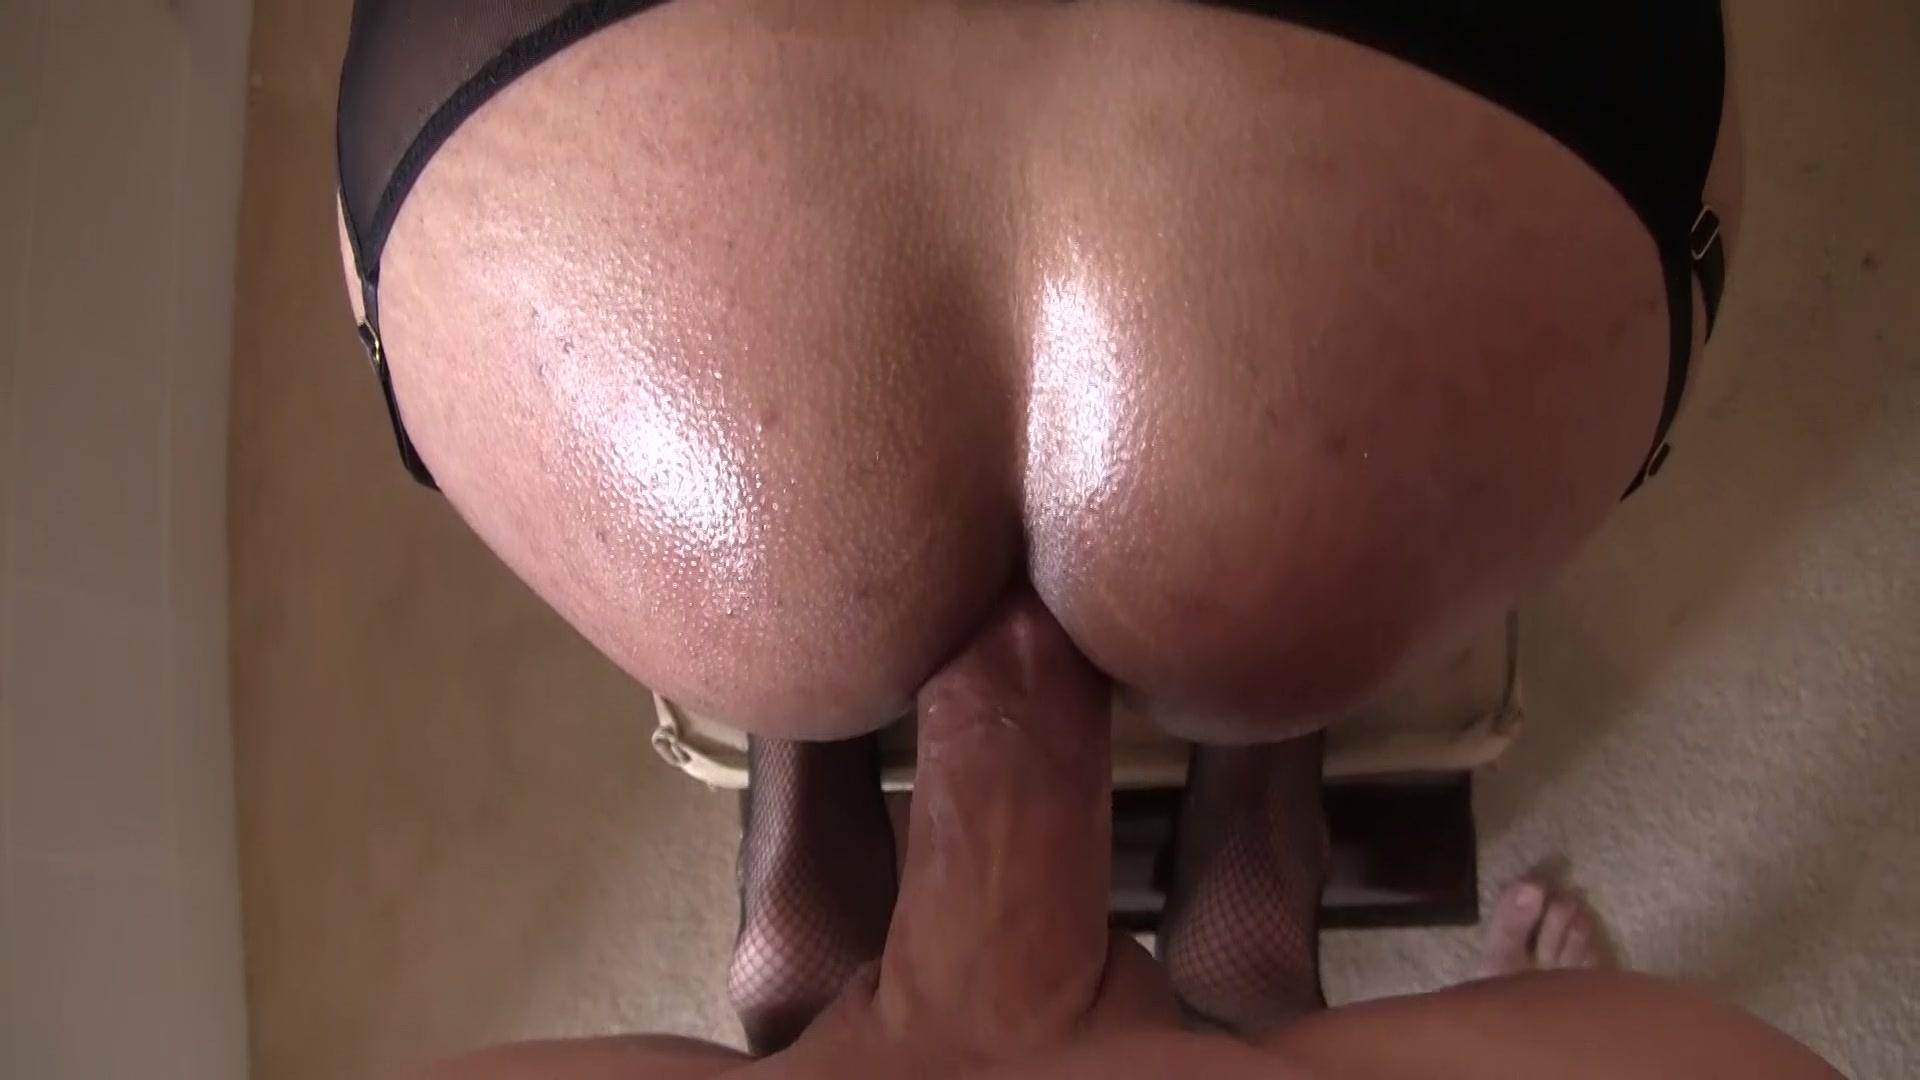 Big Booty Ts Pov Sex Videos On Demand  Adult Dvd Empire-4646